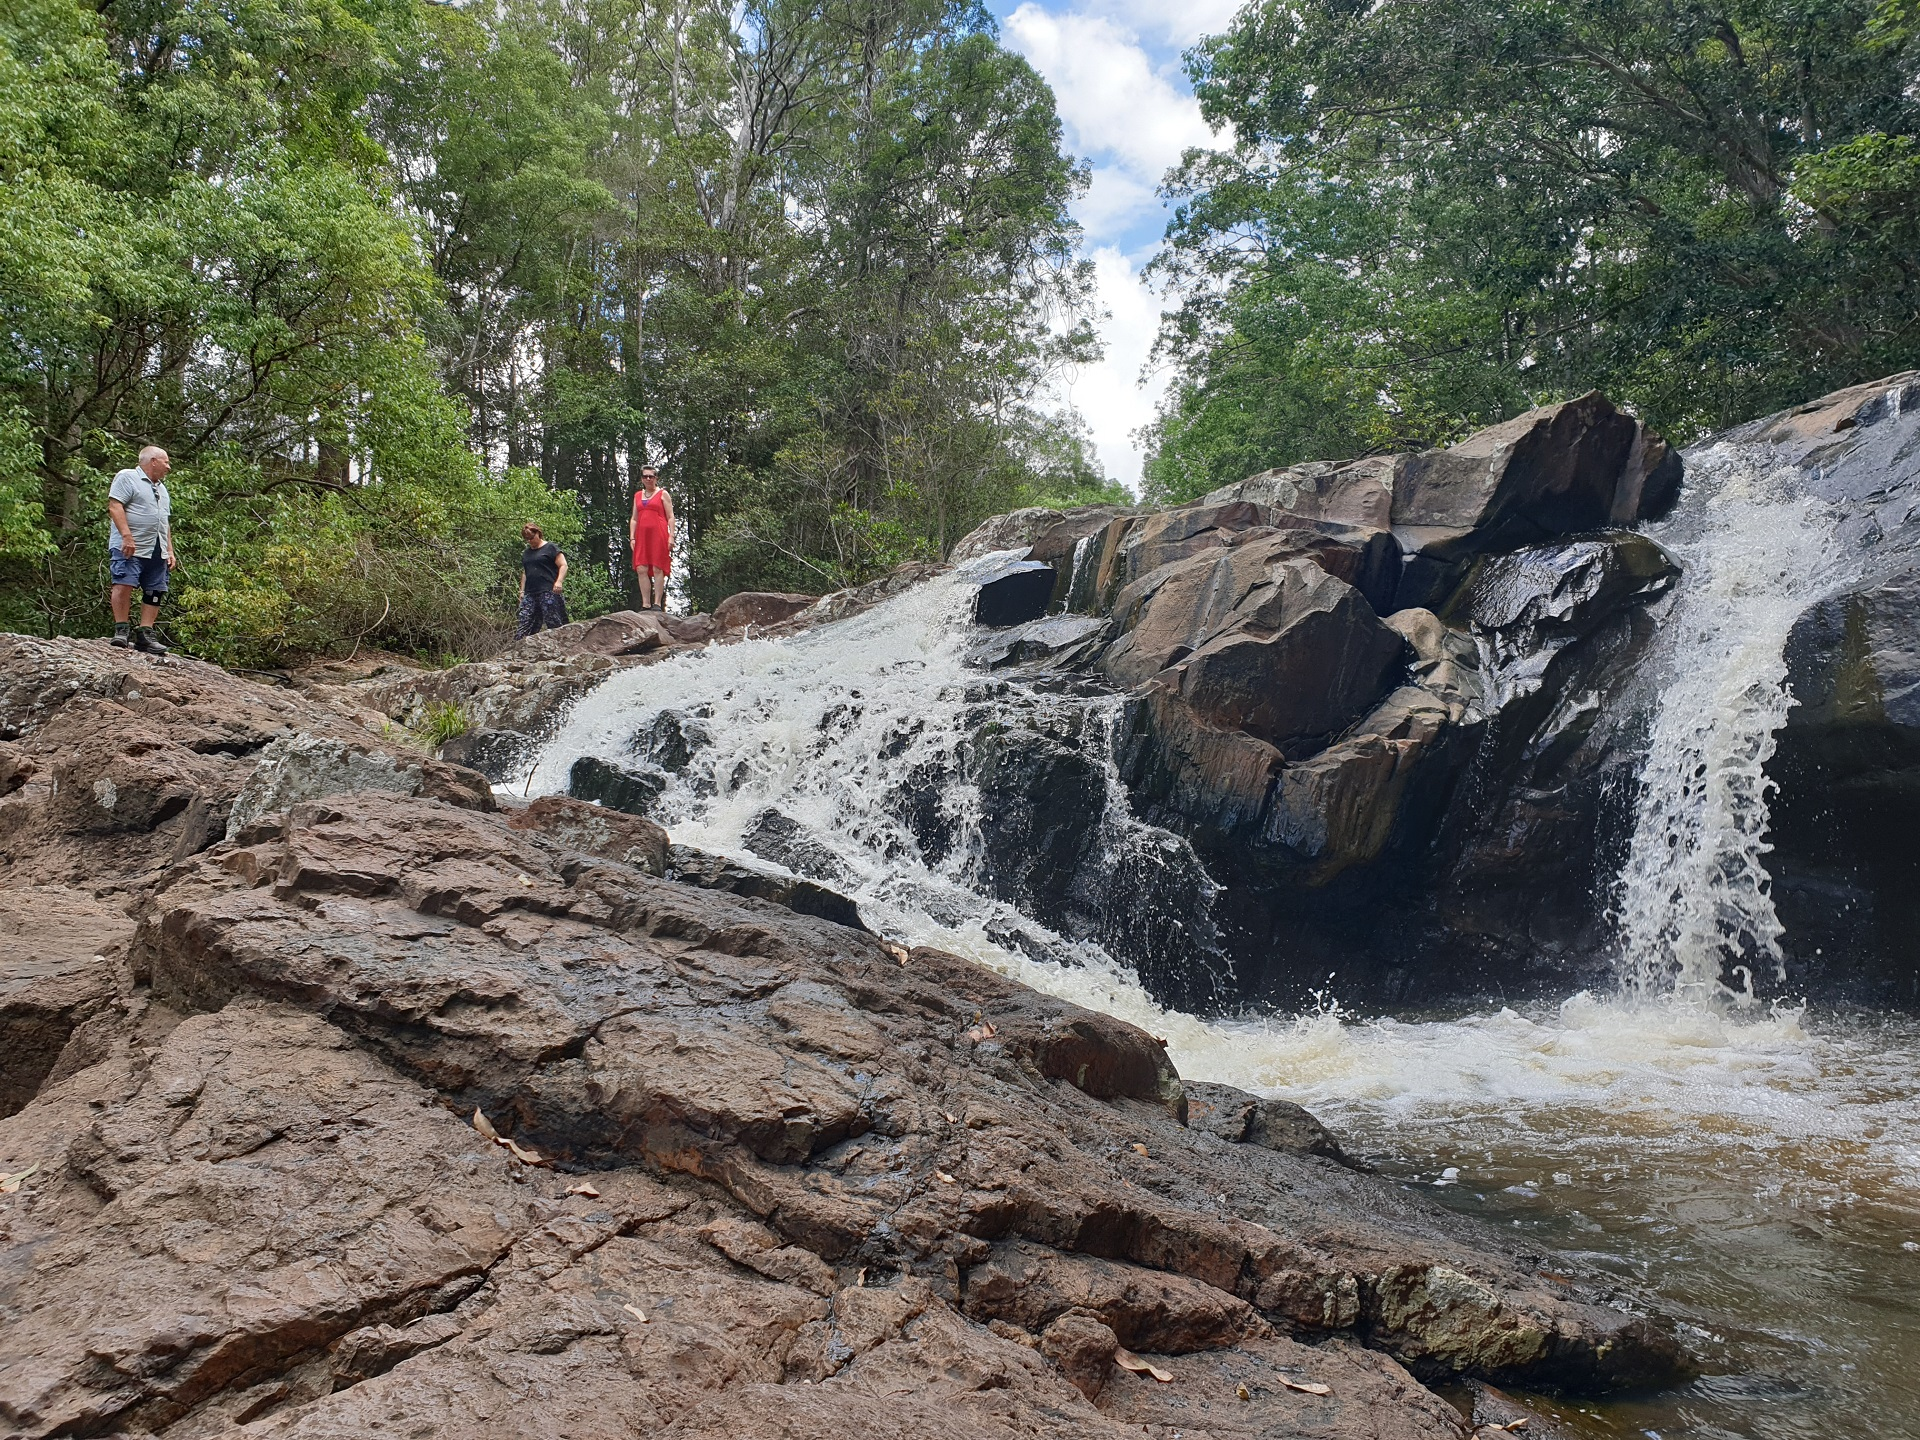 Local waterfall swimming hole